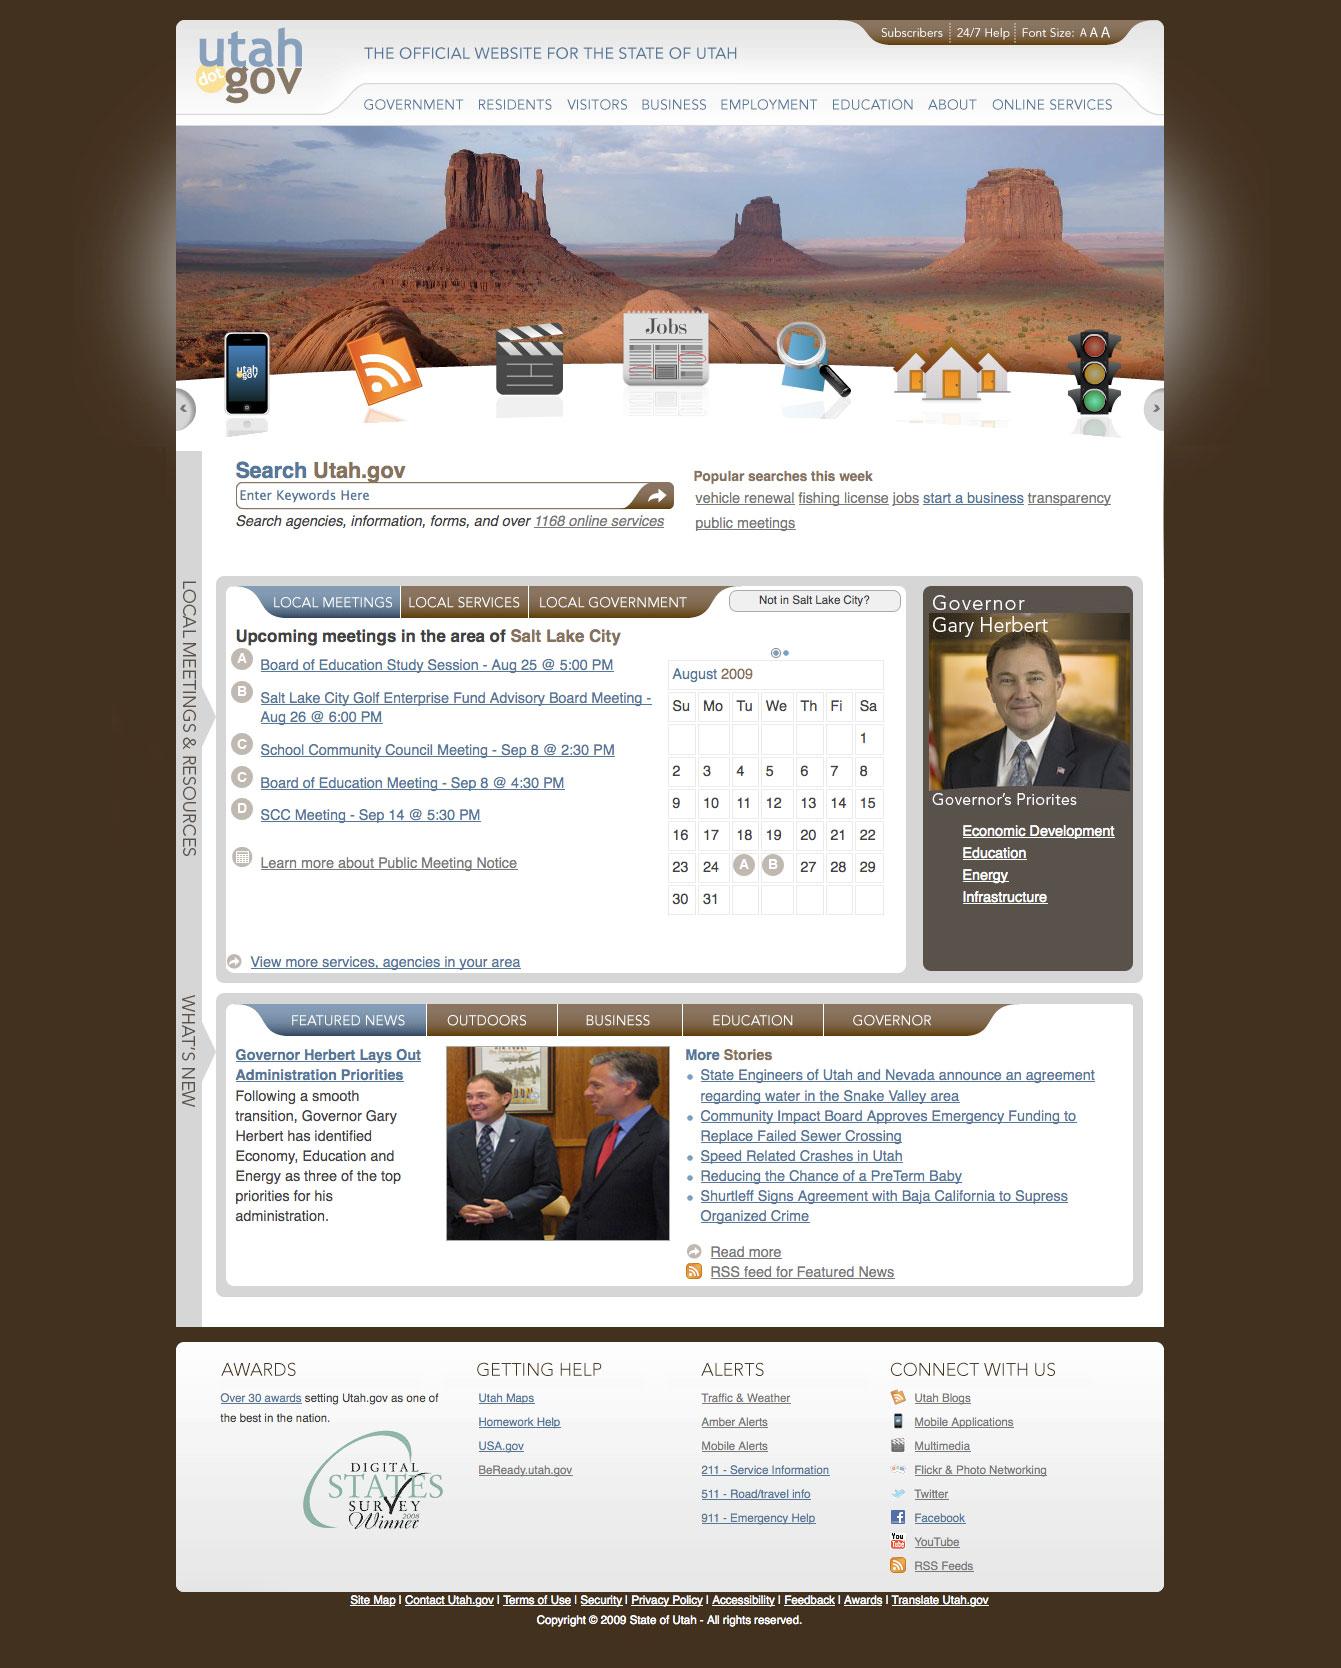 Utah.gov/The Official Website of the State of Utah image